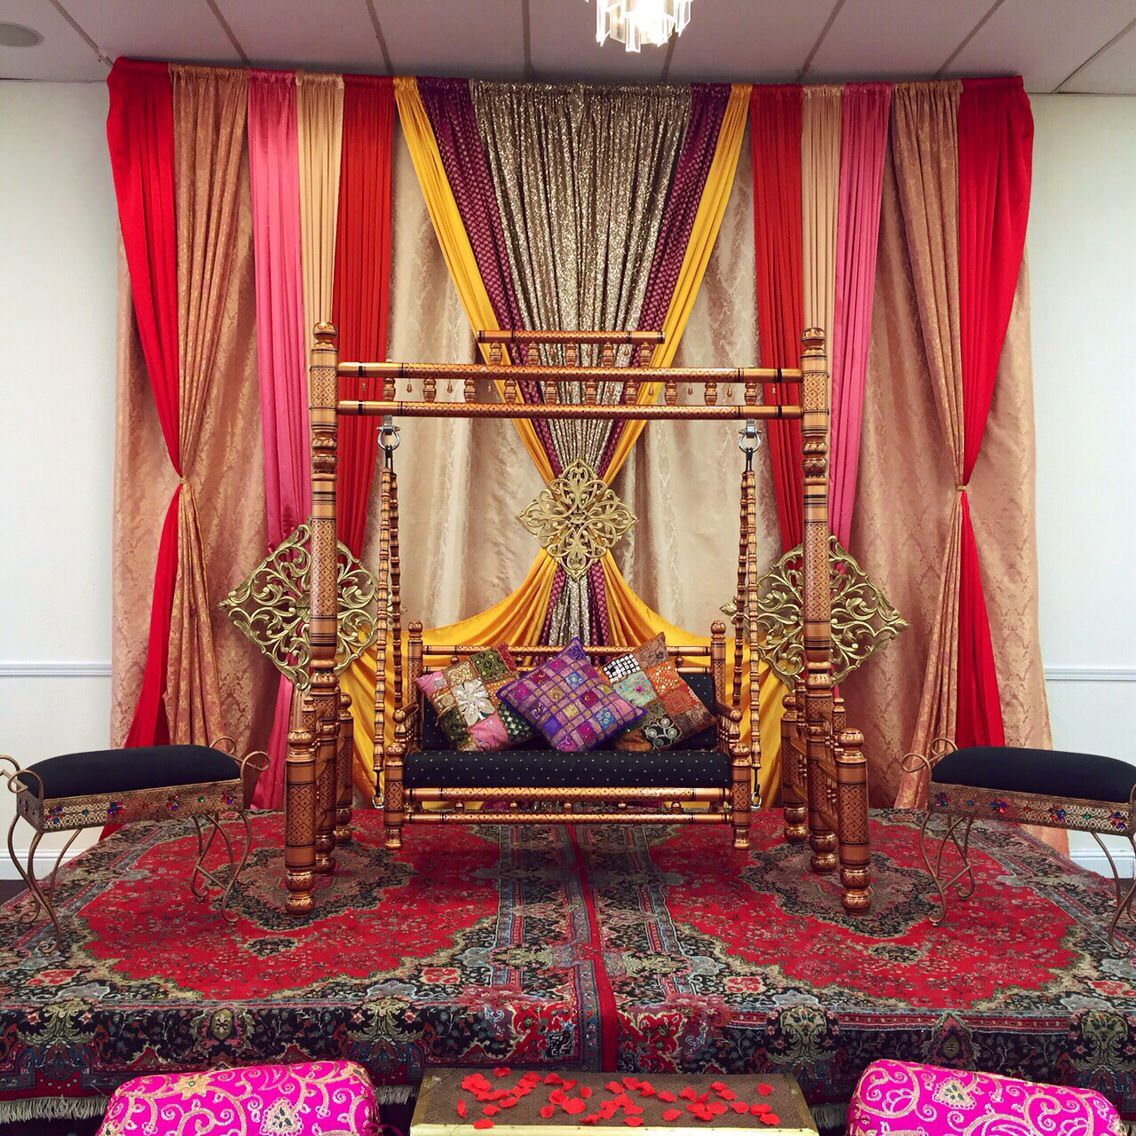 Indian wedding bedroom decoration ideas - Explore Indian Wedding Decorations And More